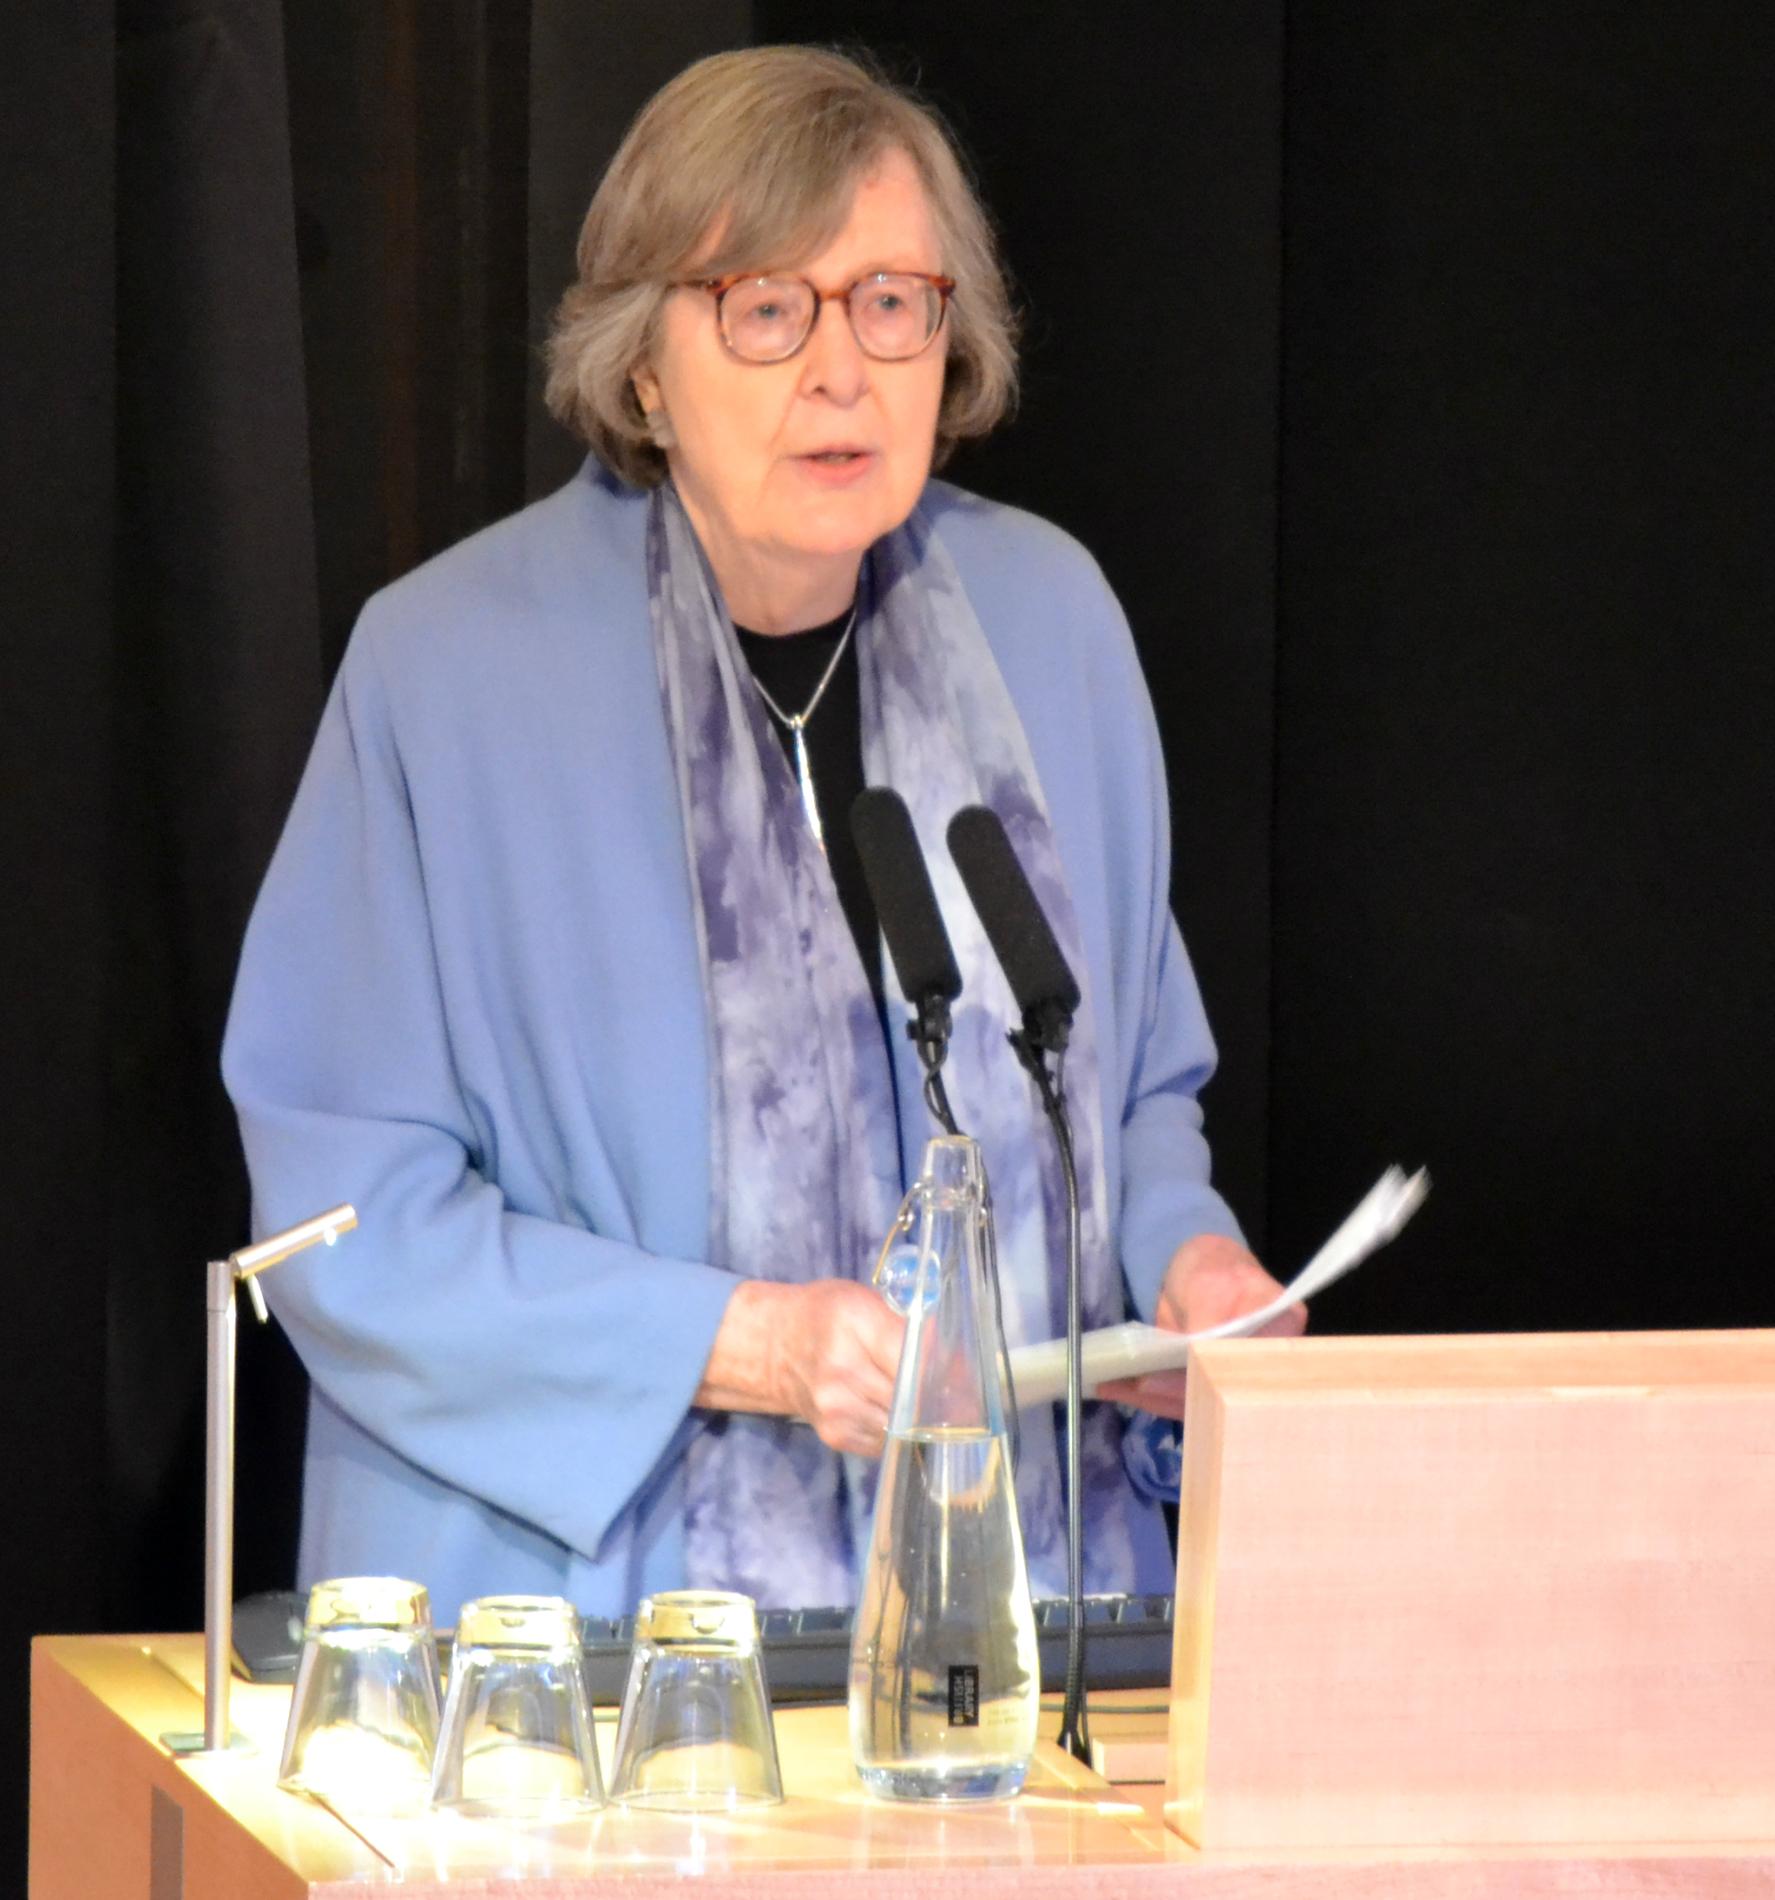 Penelope Margaret Lively (2013)